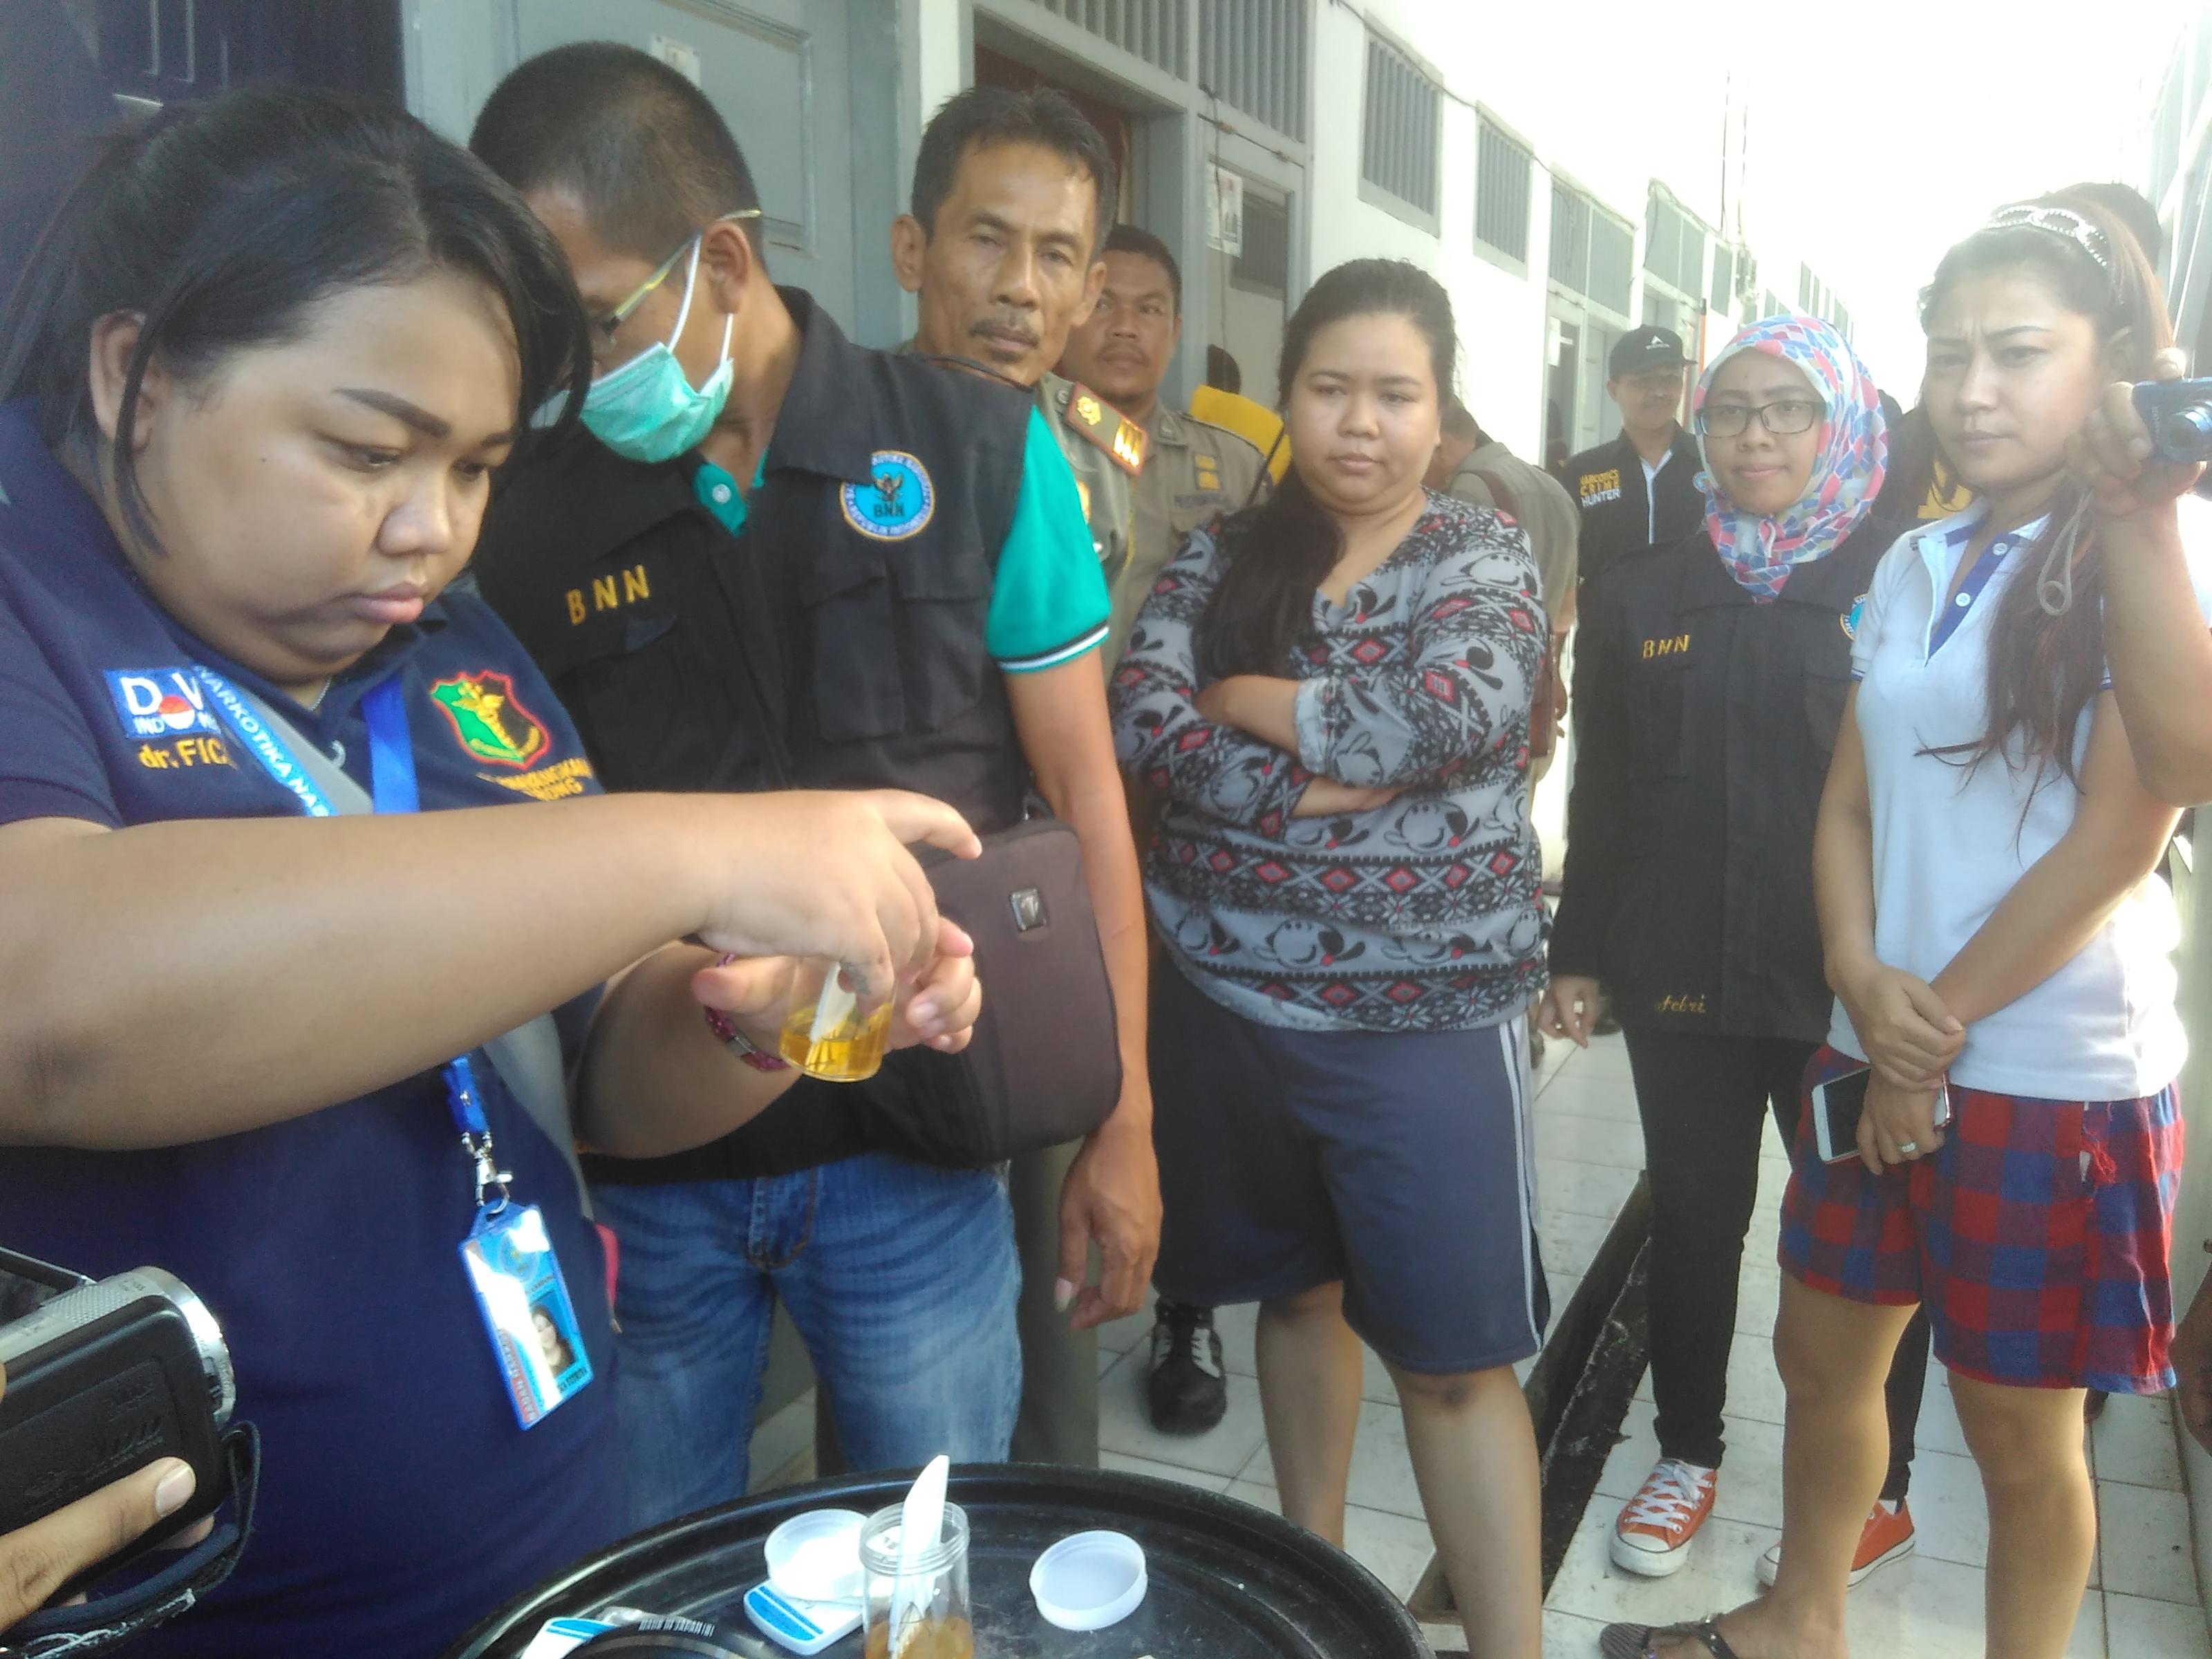 Bnn Provinsi Lampung Razia Indekos 14 Diangkut Petugas Bersama Anggota